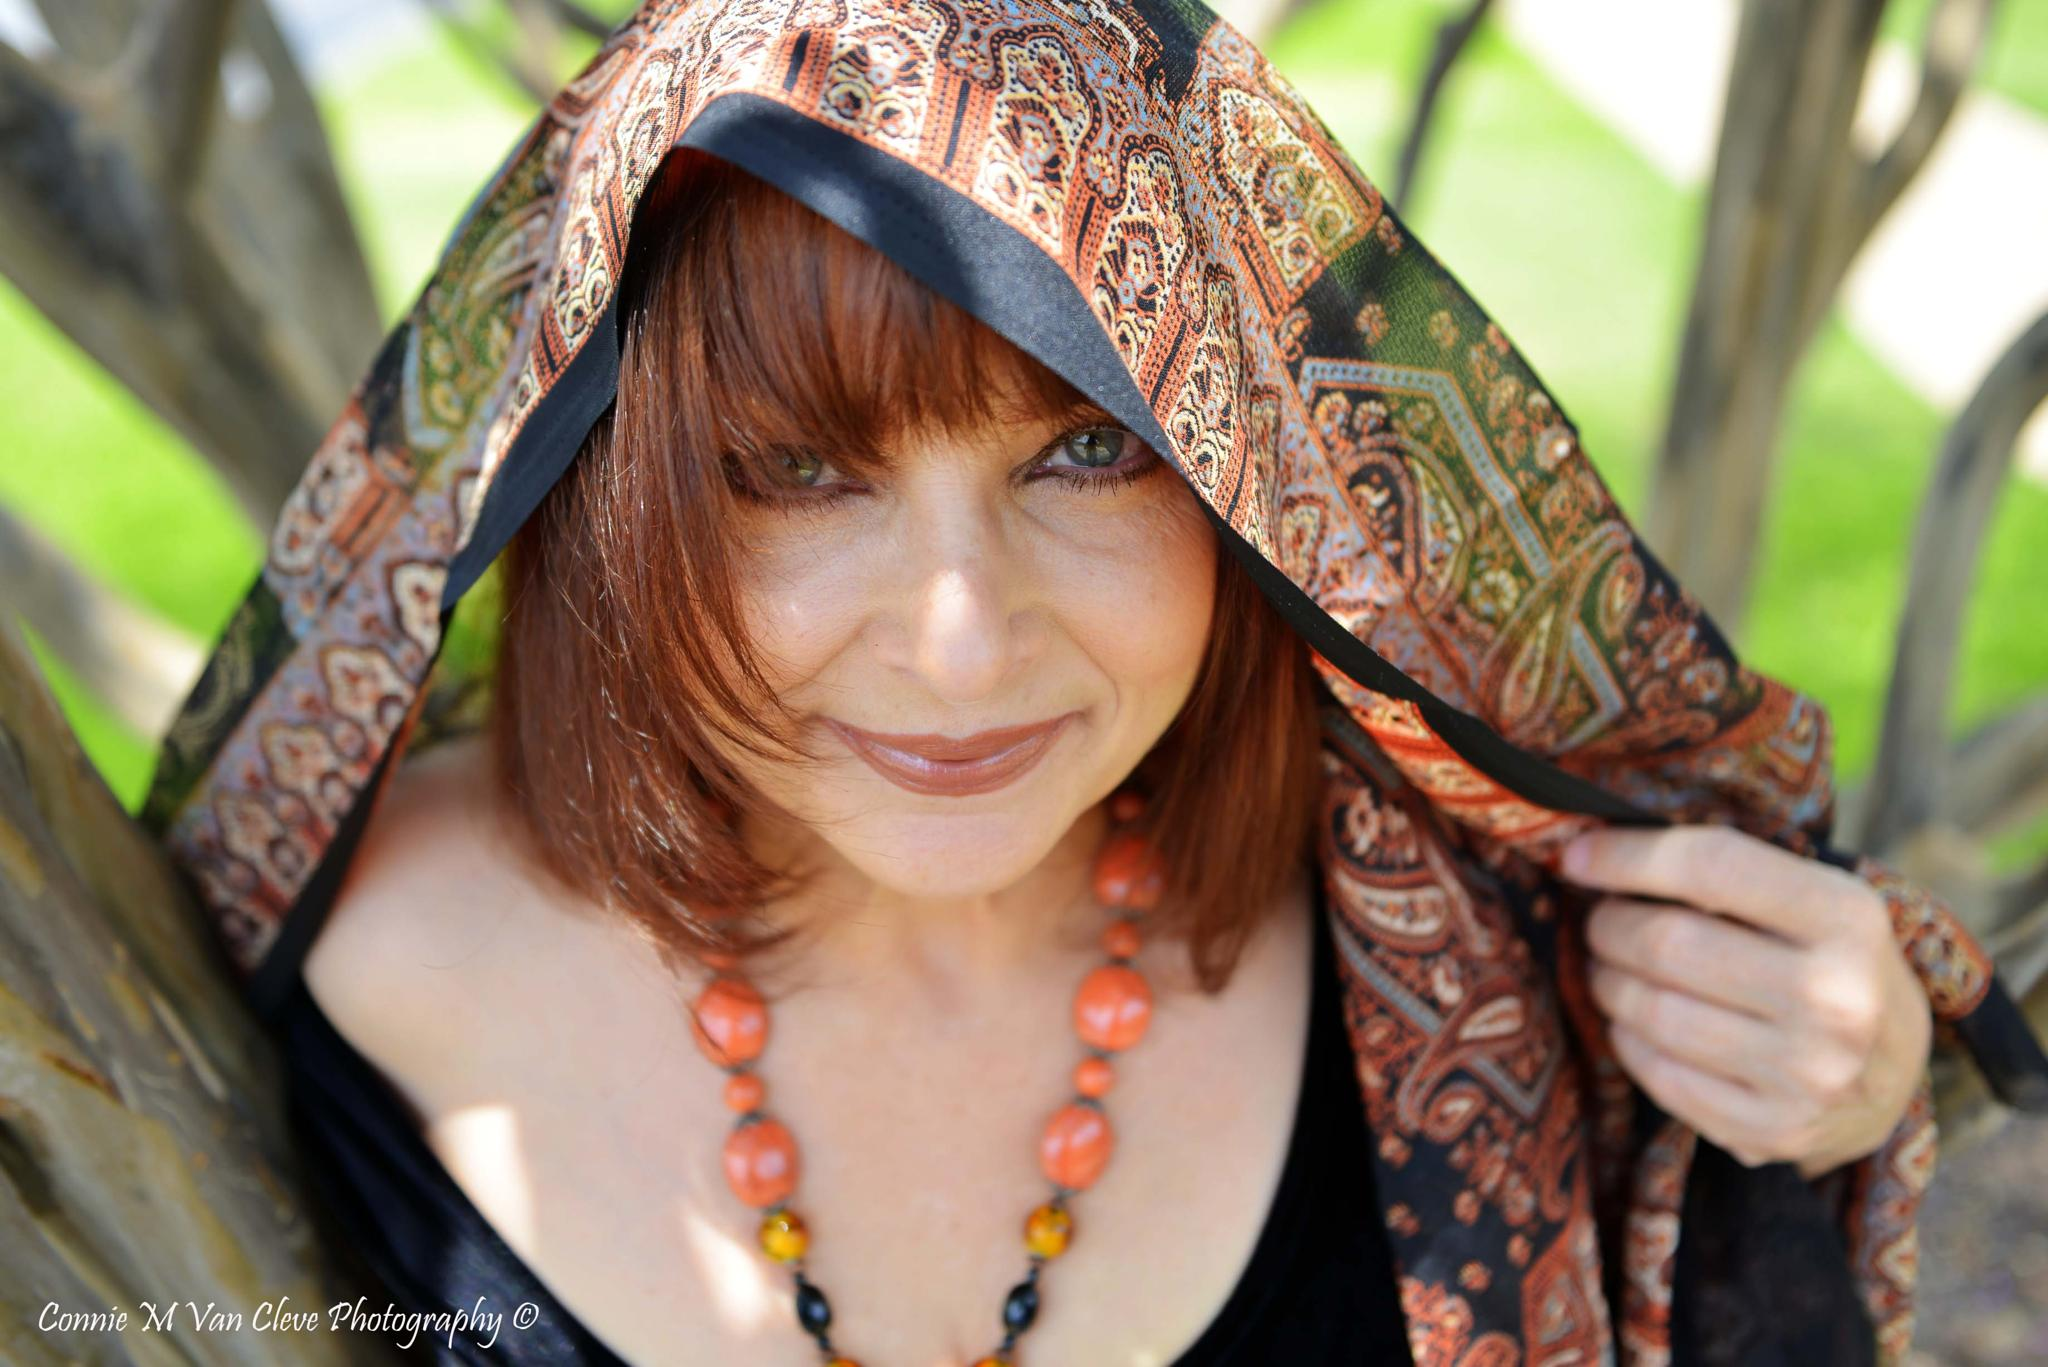 Renee Mystique by Connie M Van Cleve